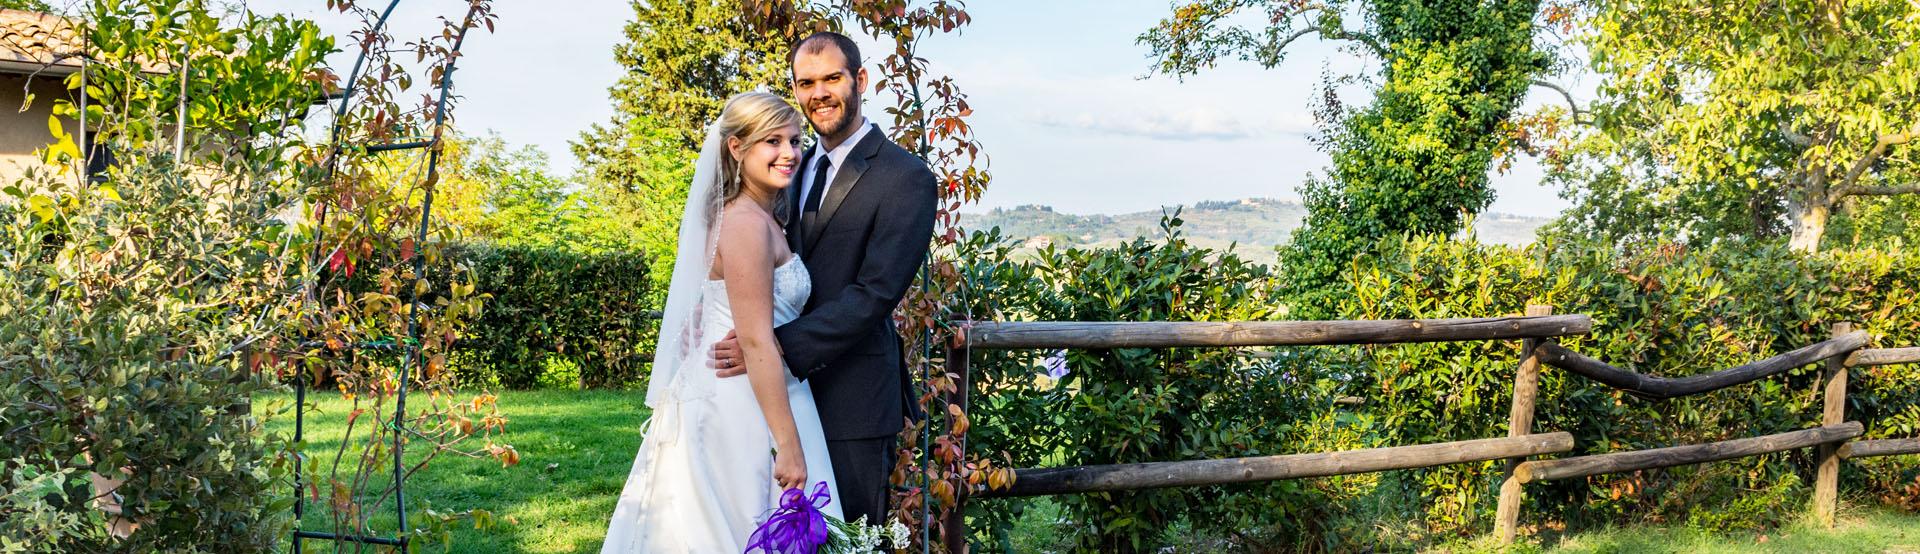 Wedding Arbor-Totally Tuscany Villas